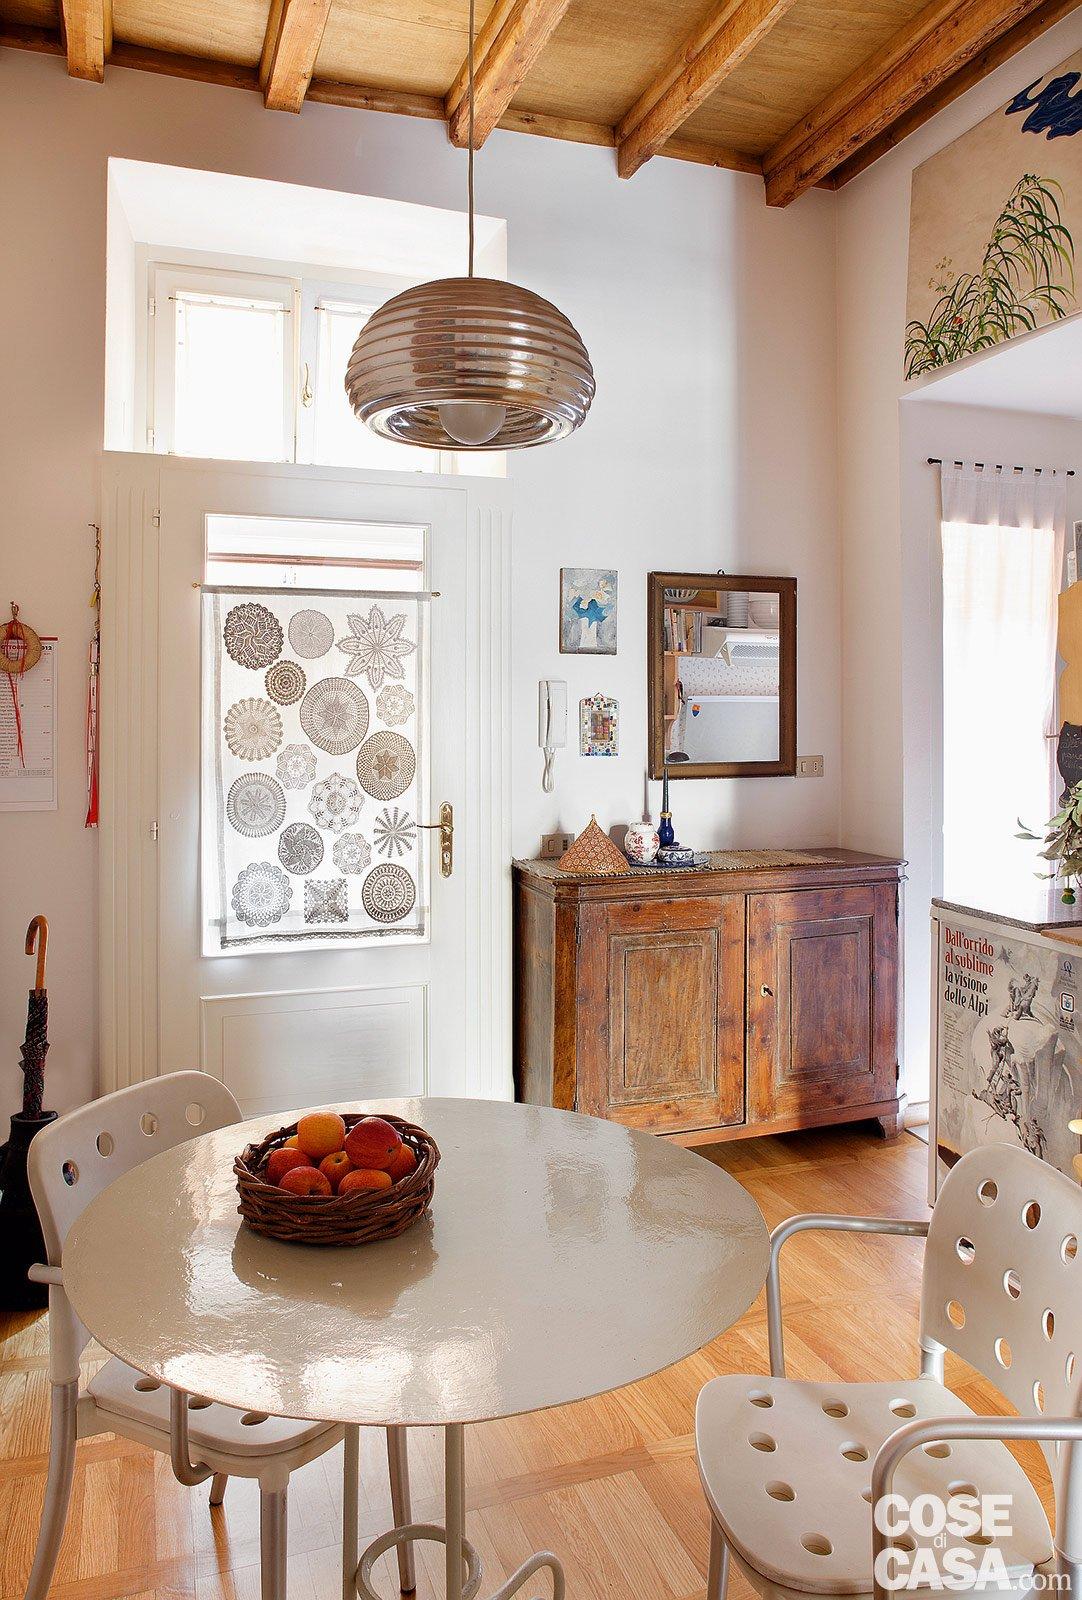 Bilocale di 40 mq una casa fai da te cose di casa for Arredare casa di 40 mq